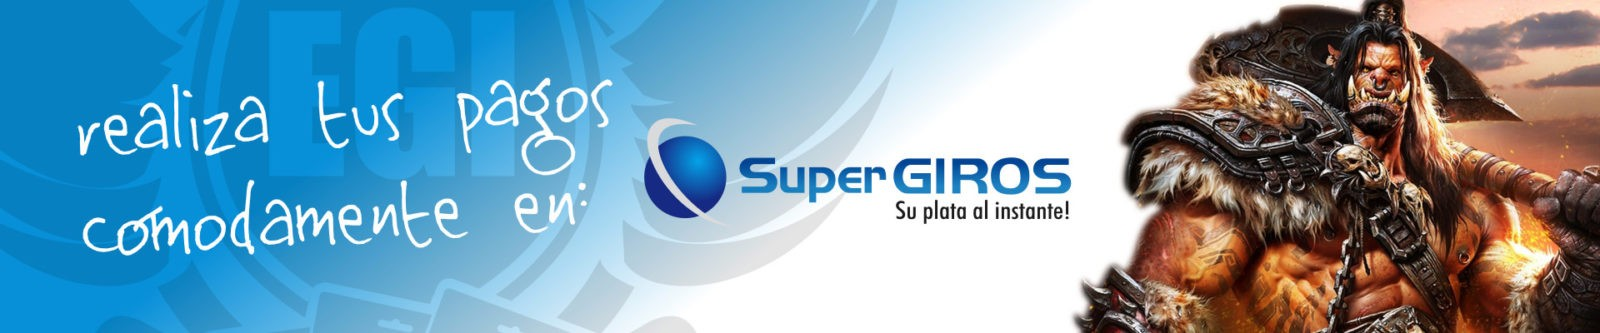 banner-supergiros